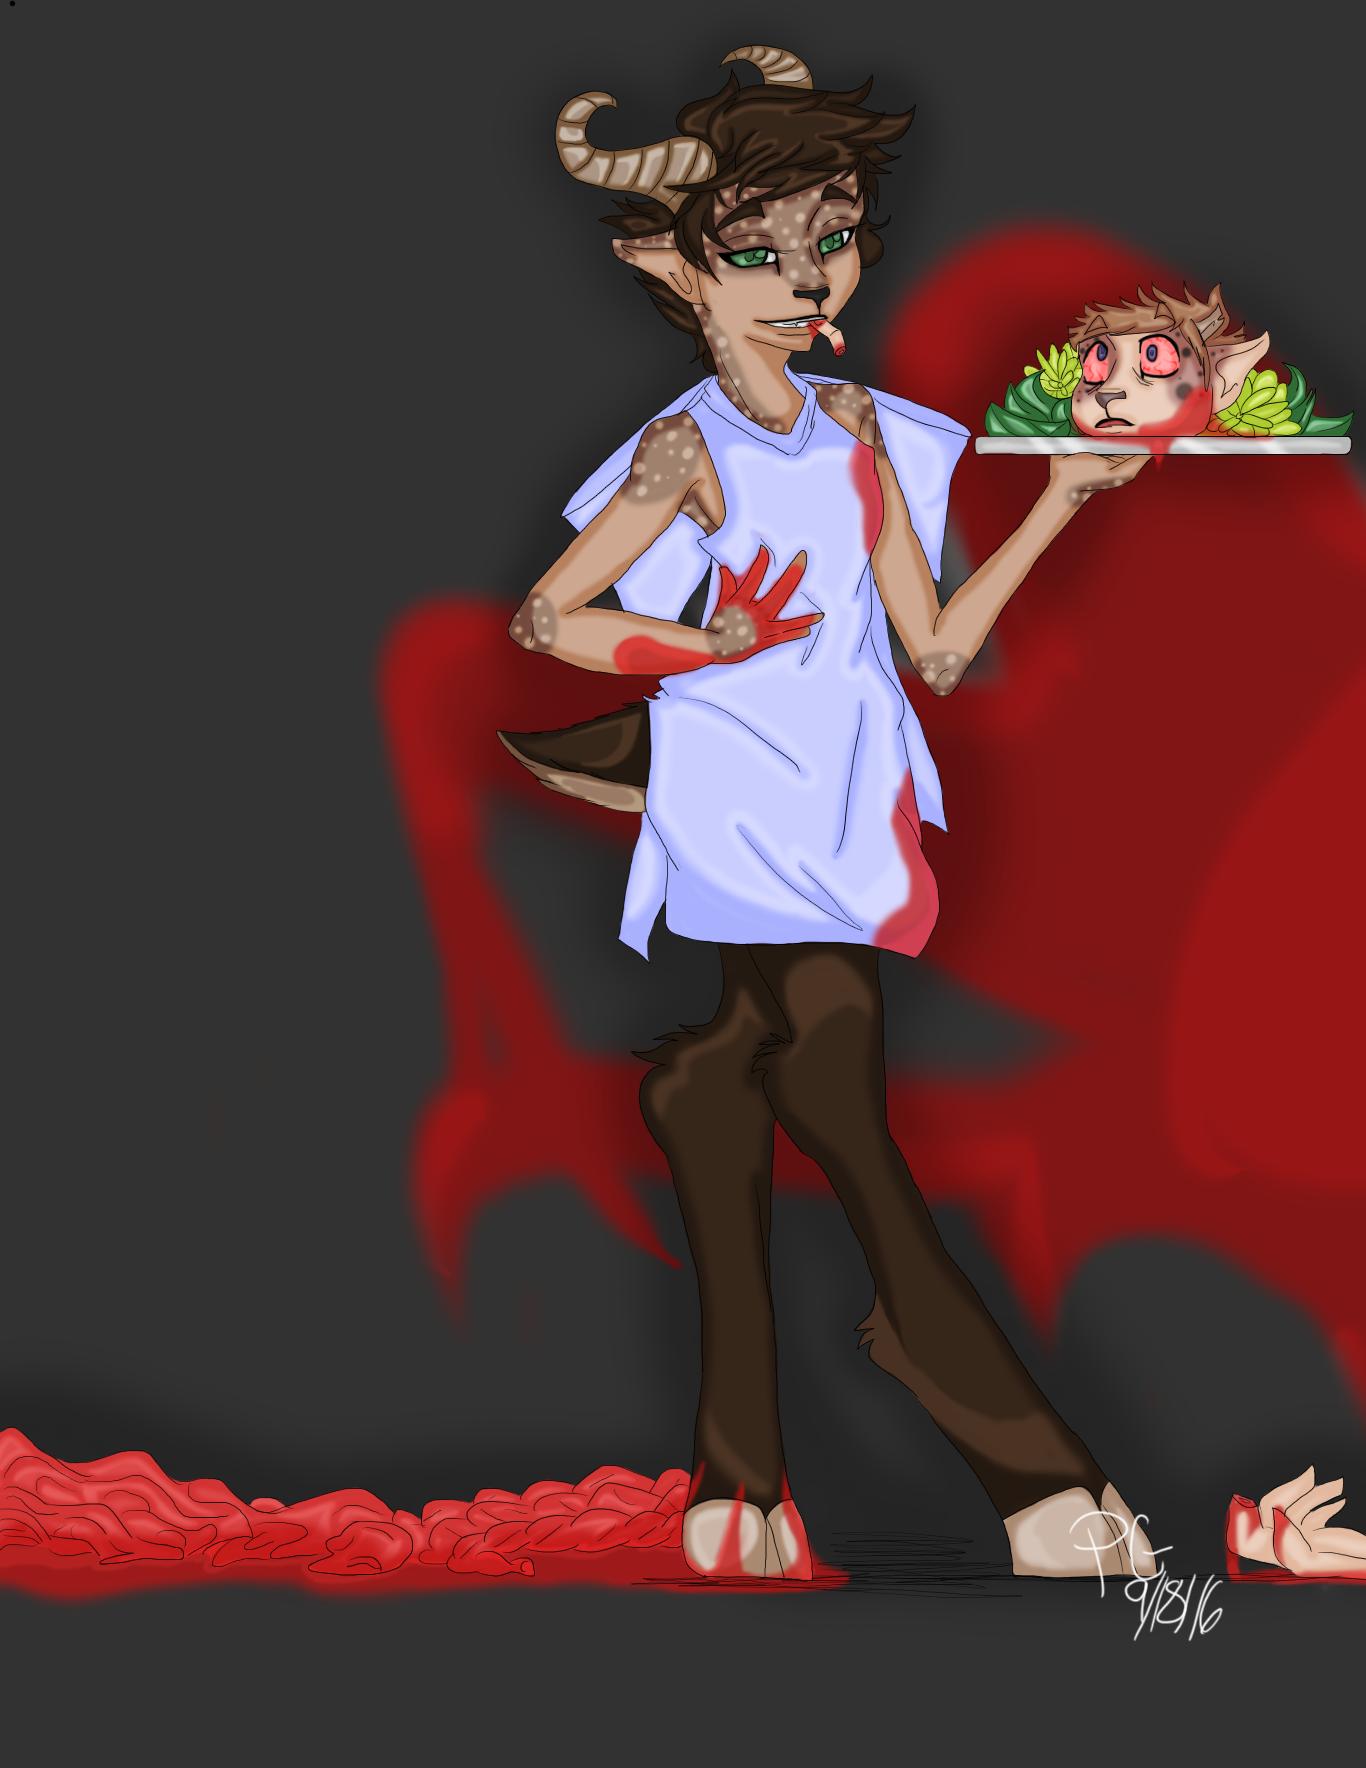 Gore Demise - Chestnutt the cannibal